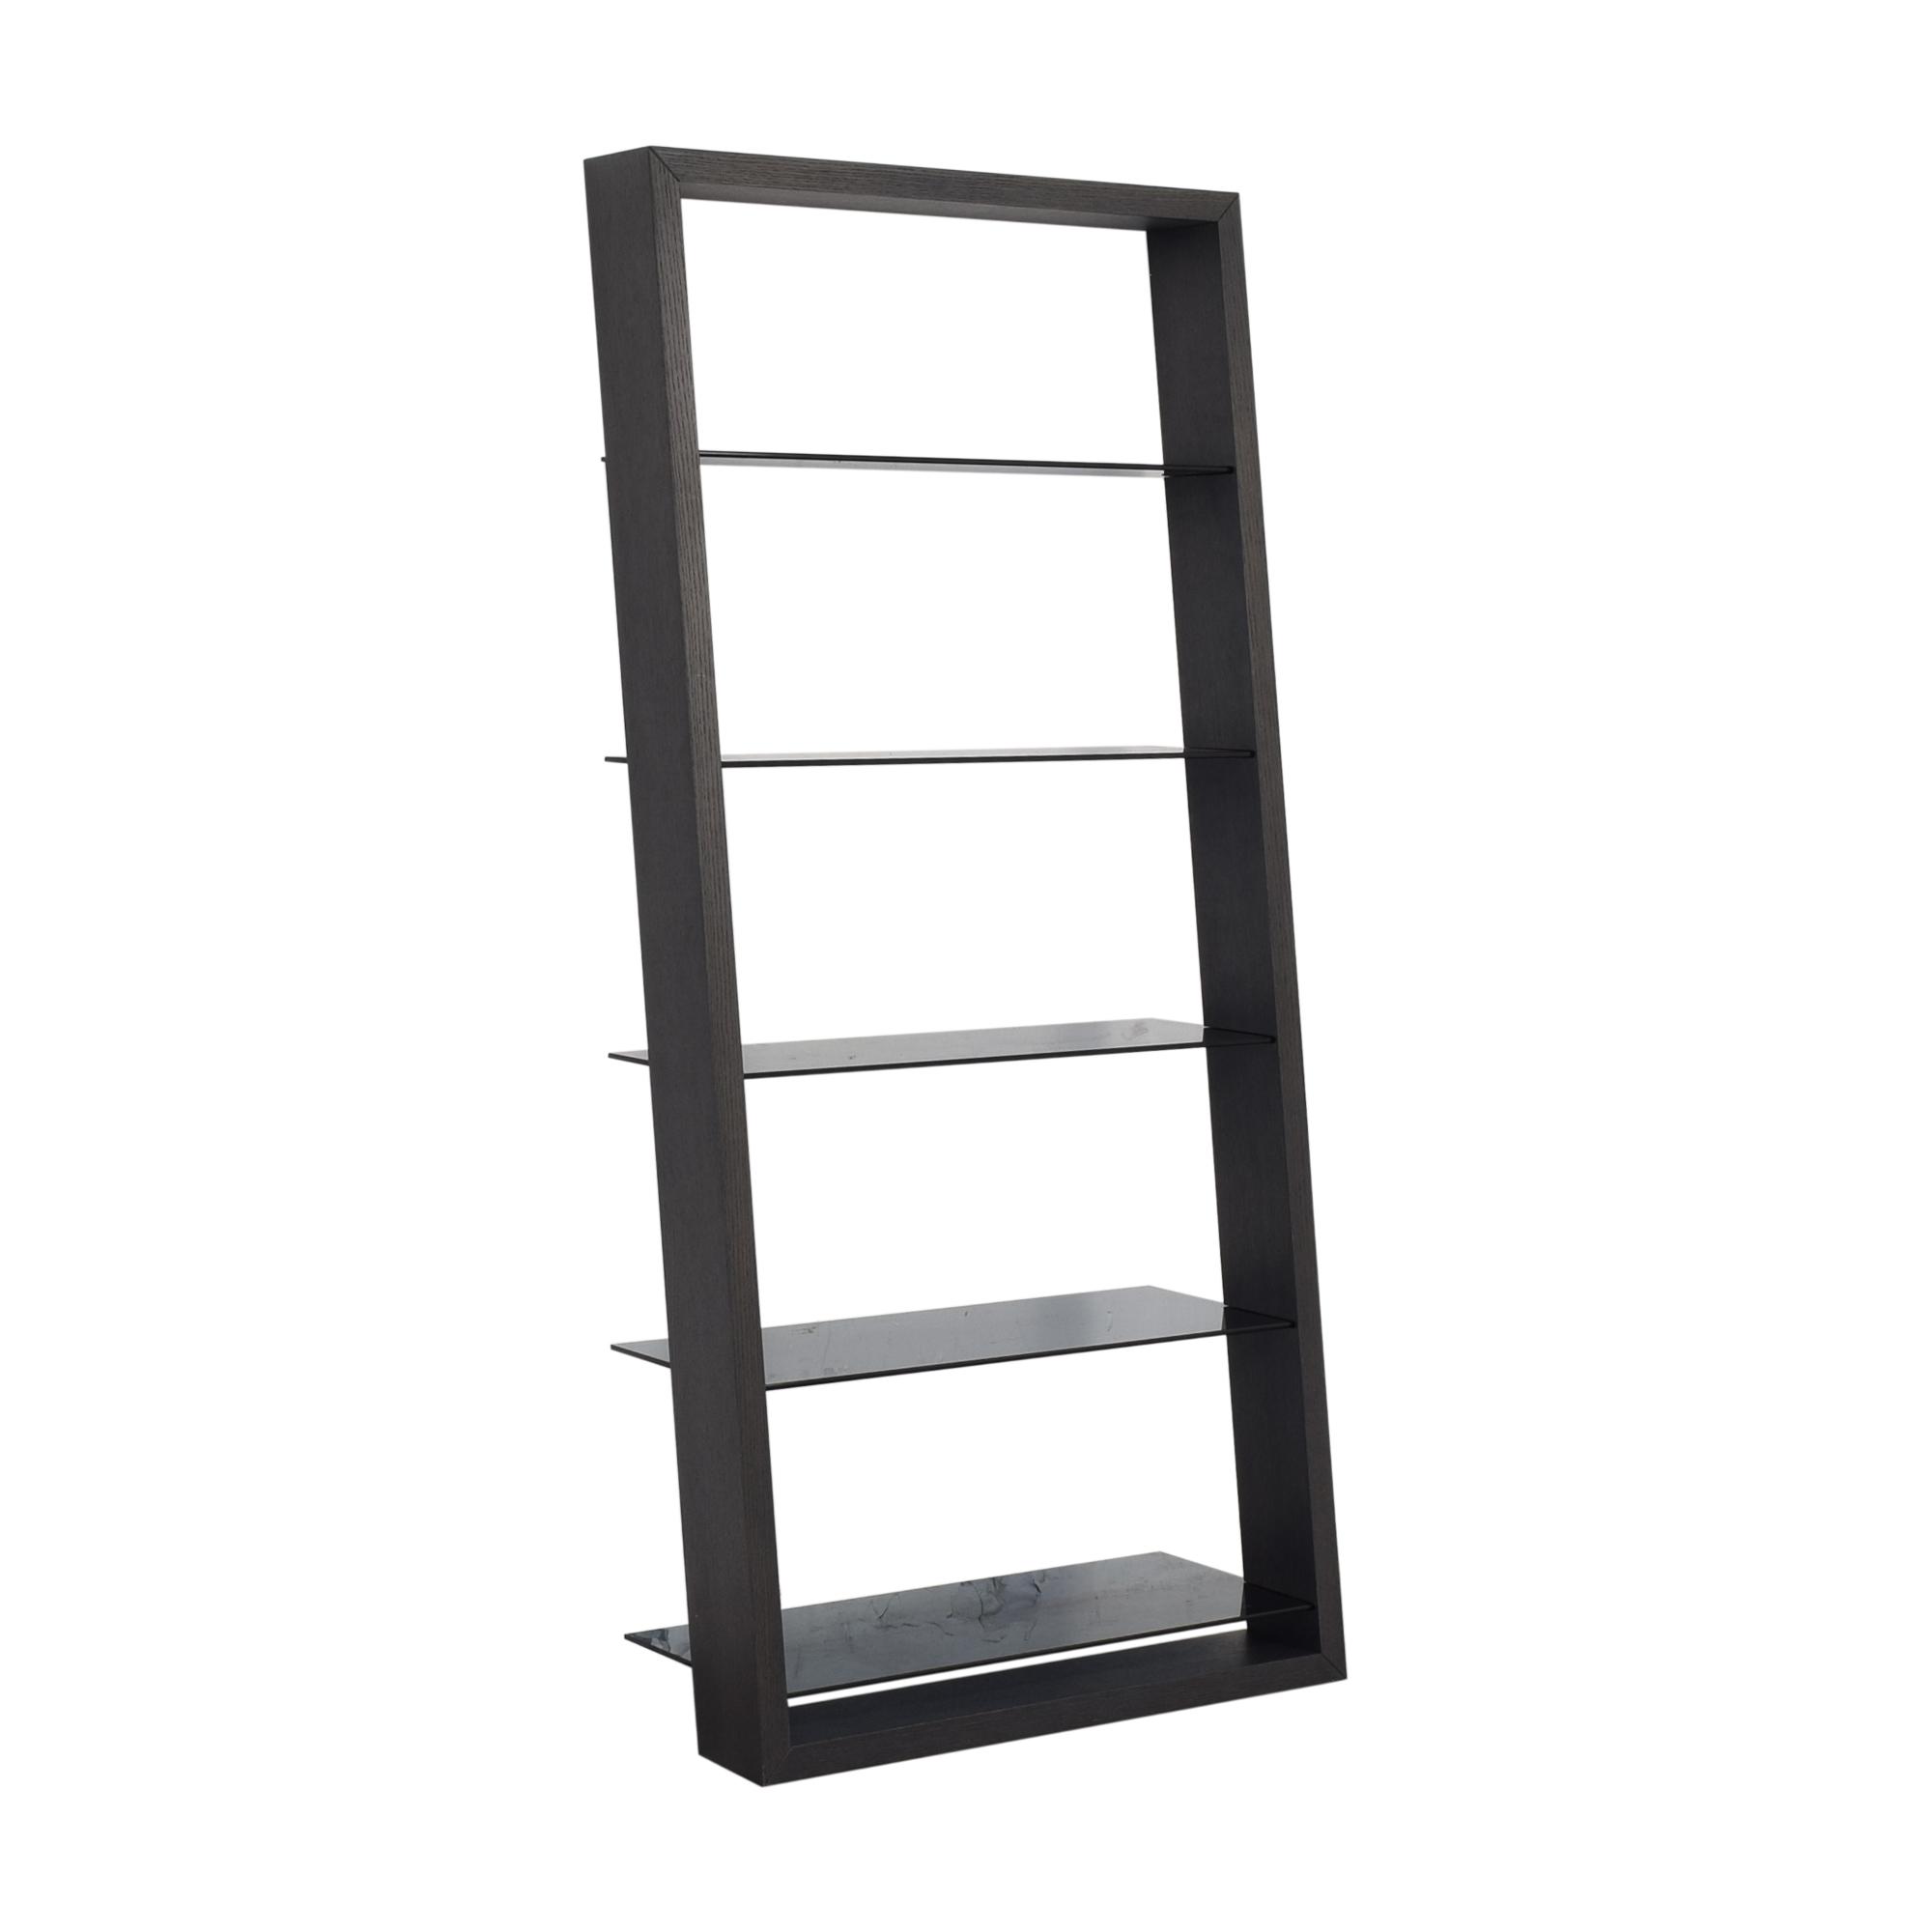 BDI Furniture Jensen-Lewis BDI Eileen Leaning Shelf price